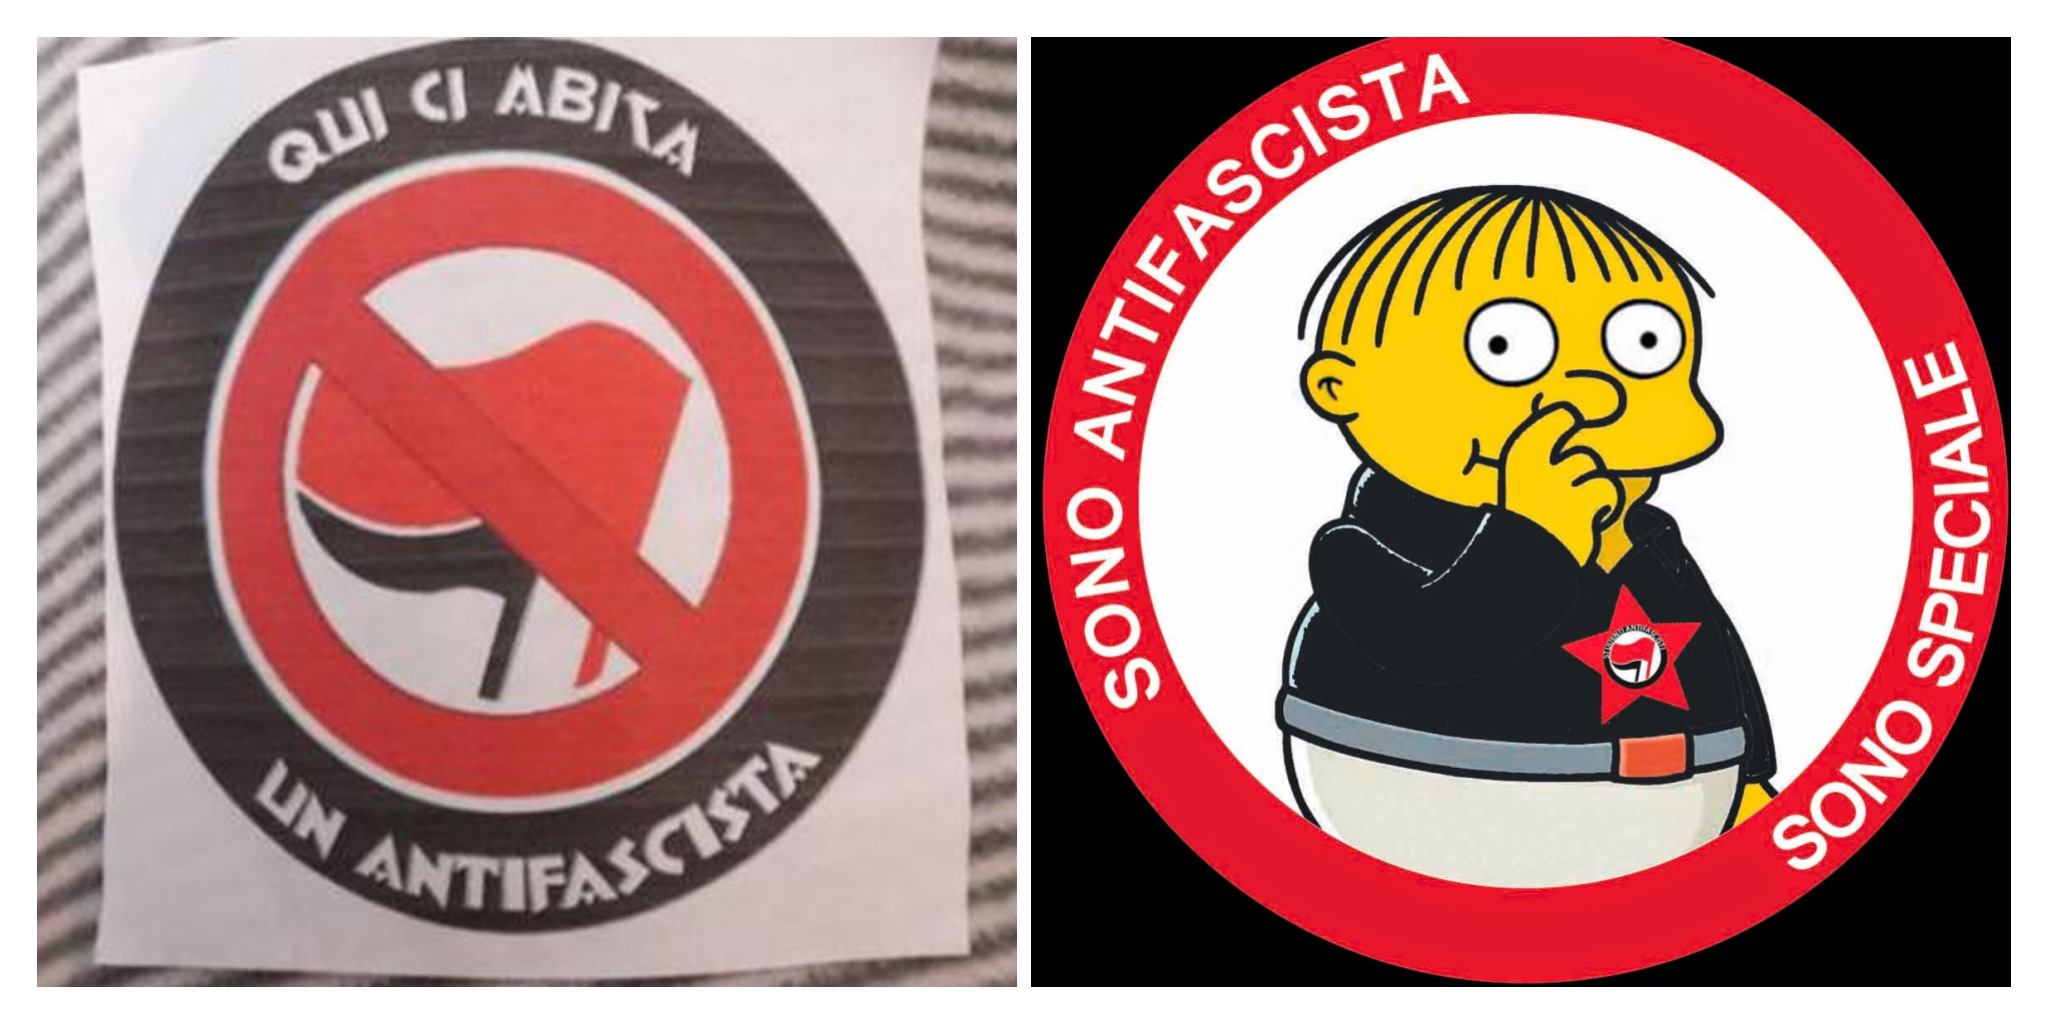 pavia-adesivi-antifascisti